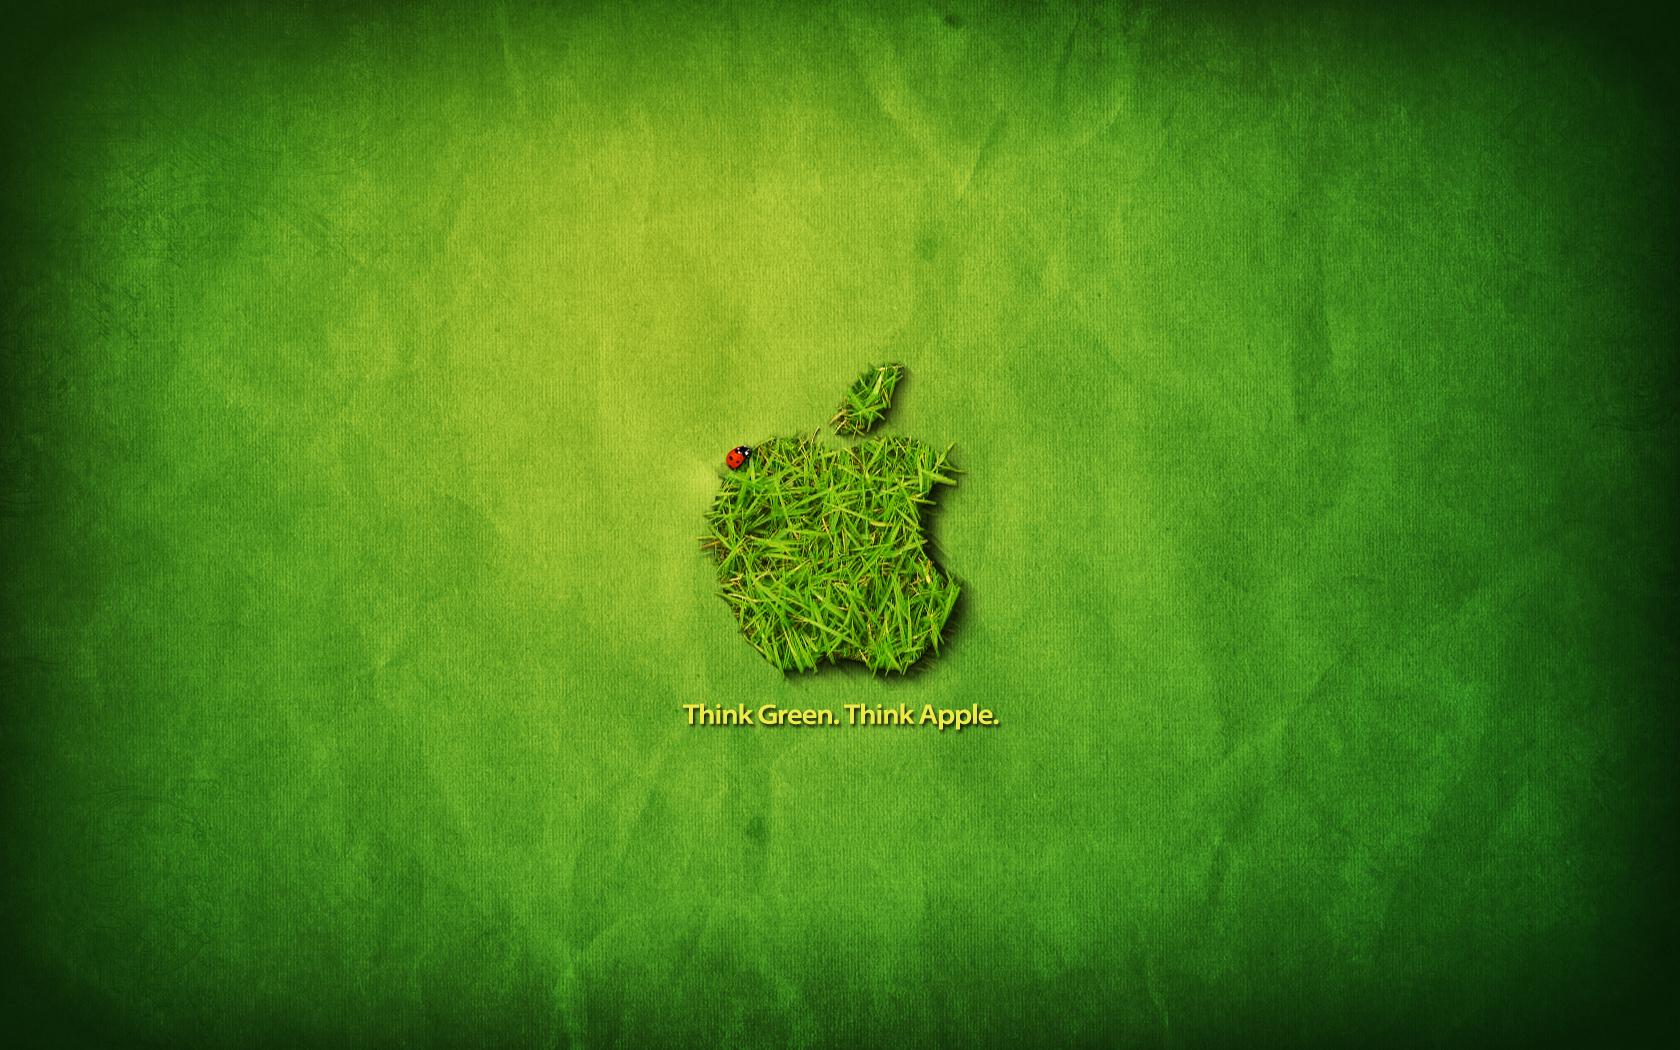 Apple Think Green Background HD Desktop Wallpaper   Green Photo 1680x1050